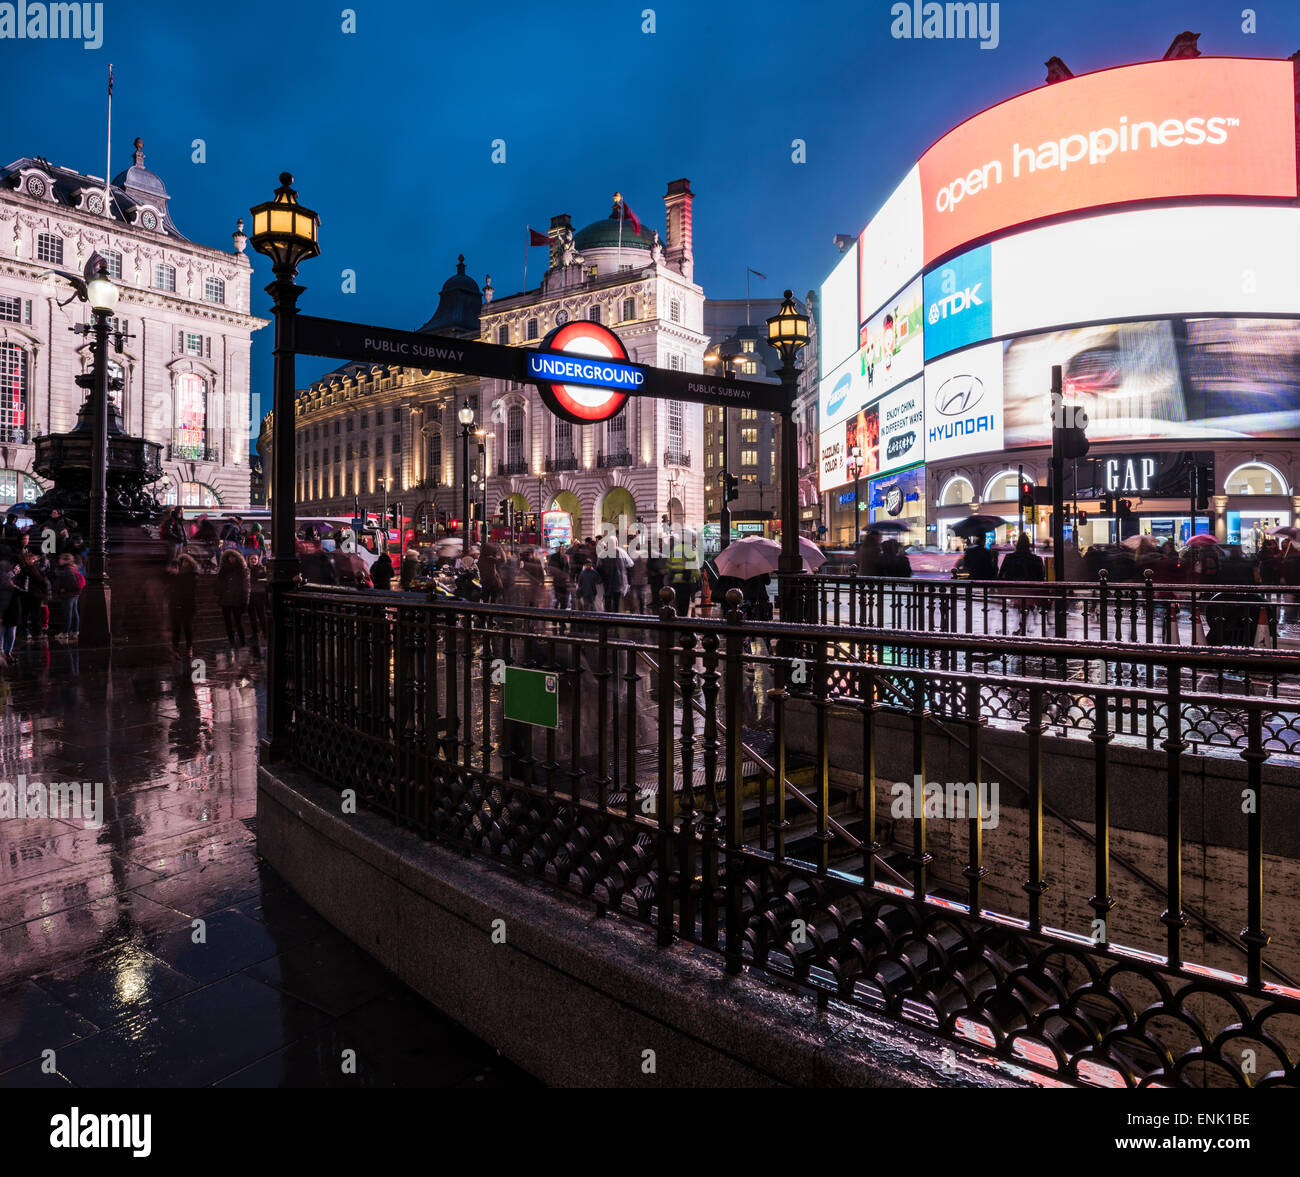 Piccadily Circus at night, London, England, United Kingdom, Europe - Stock Image